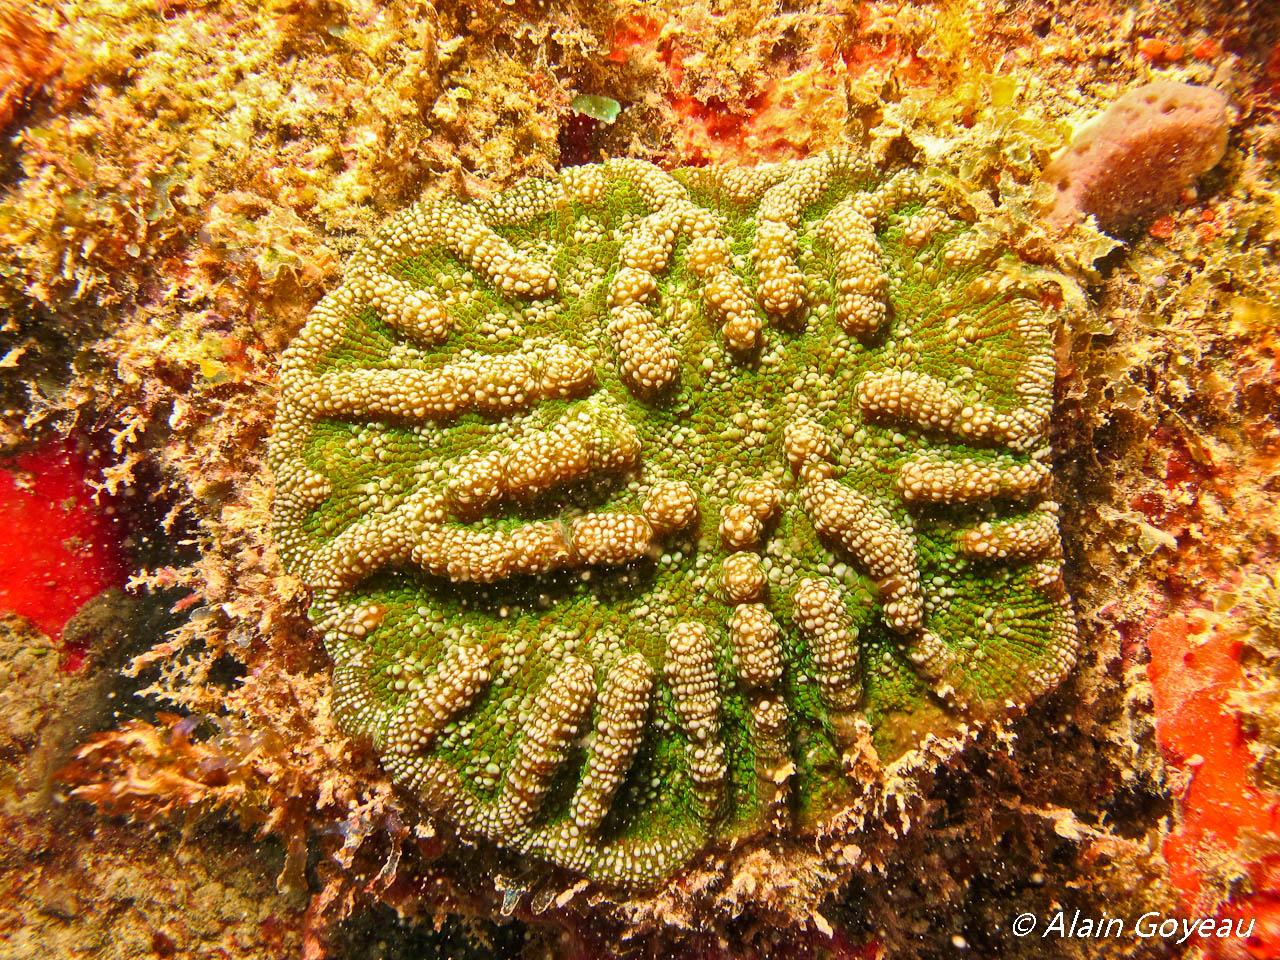 Mycetophyllia aliciae: Corail cactus rugueux.